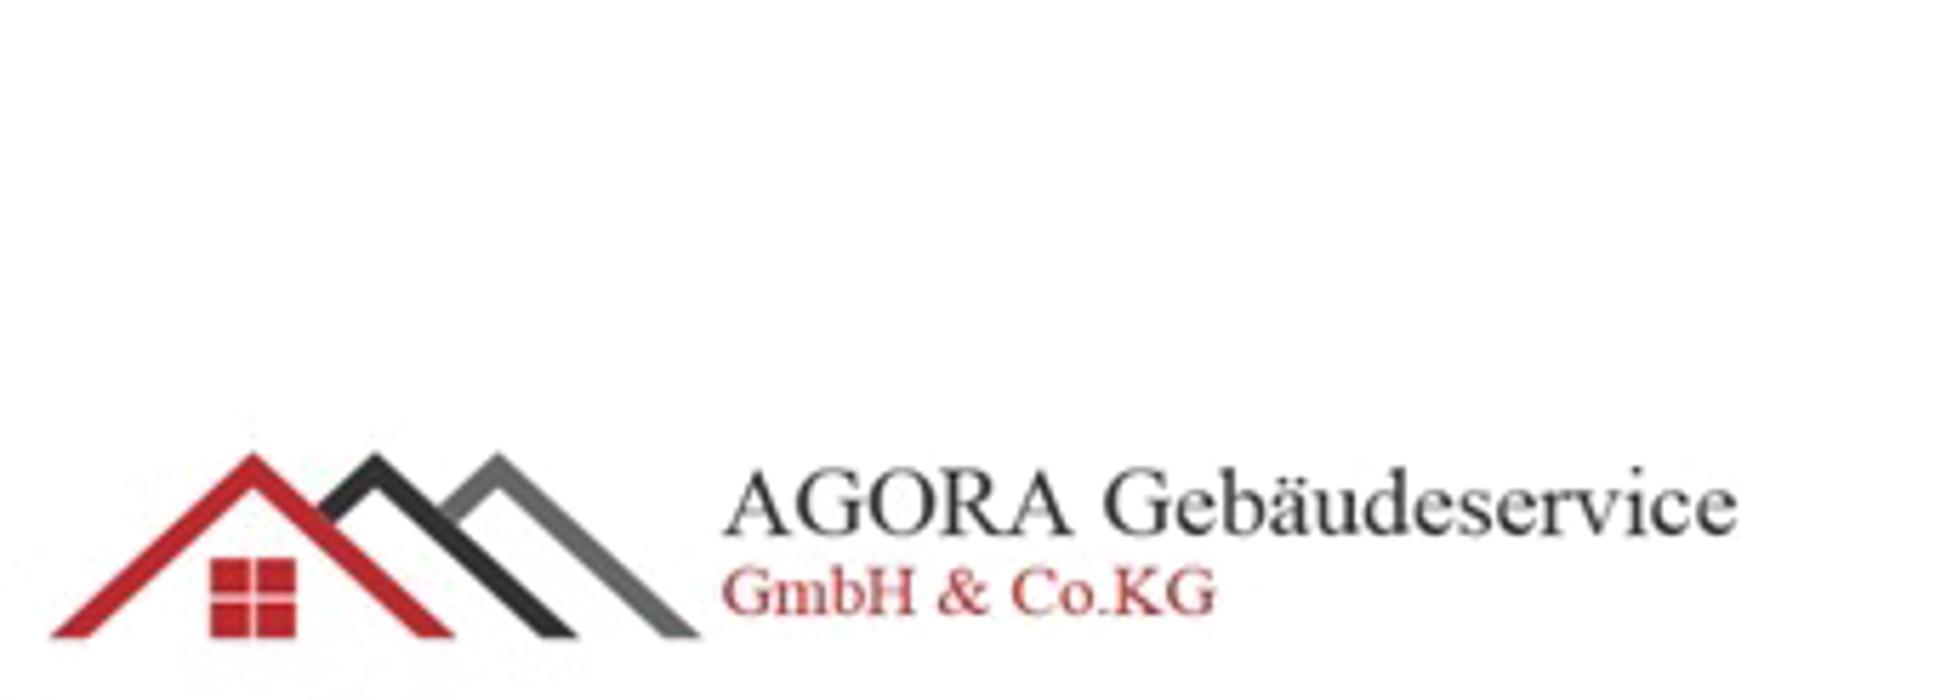 AGORA Gebäudeservice GmbH & Co.KG